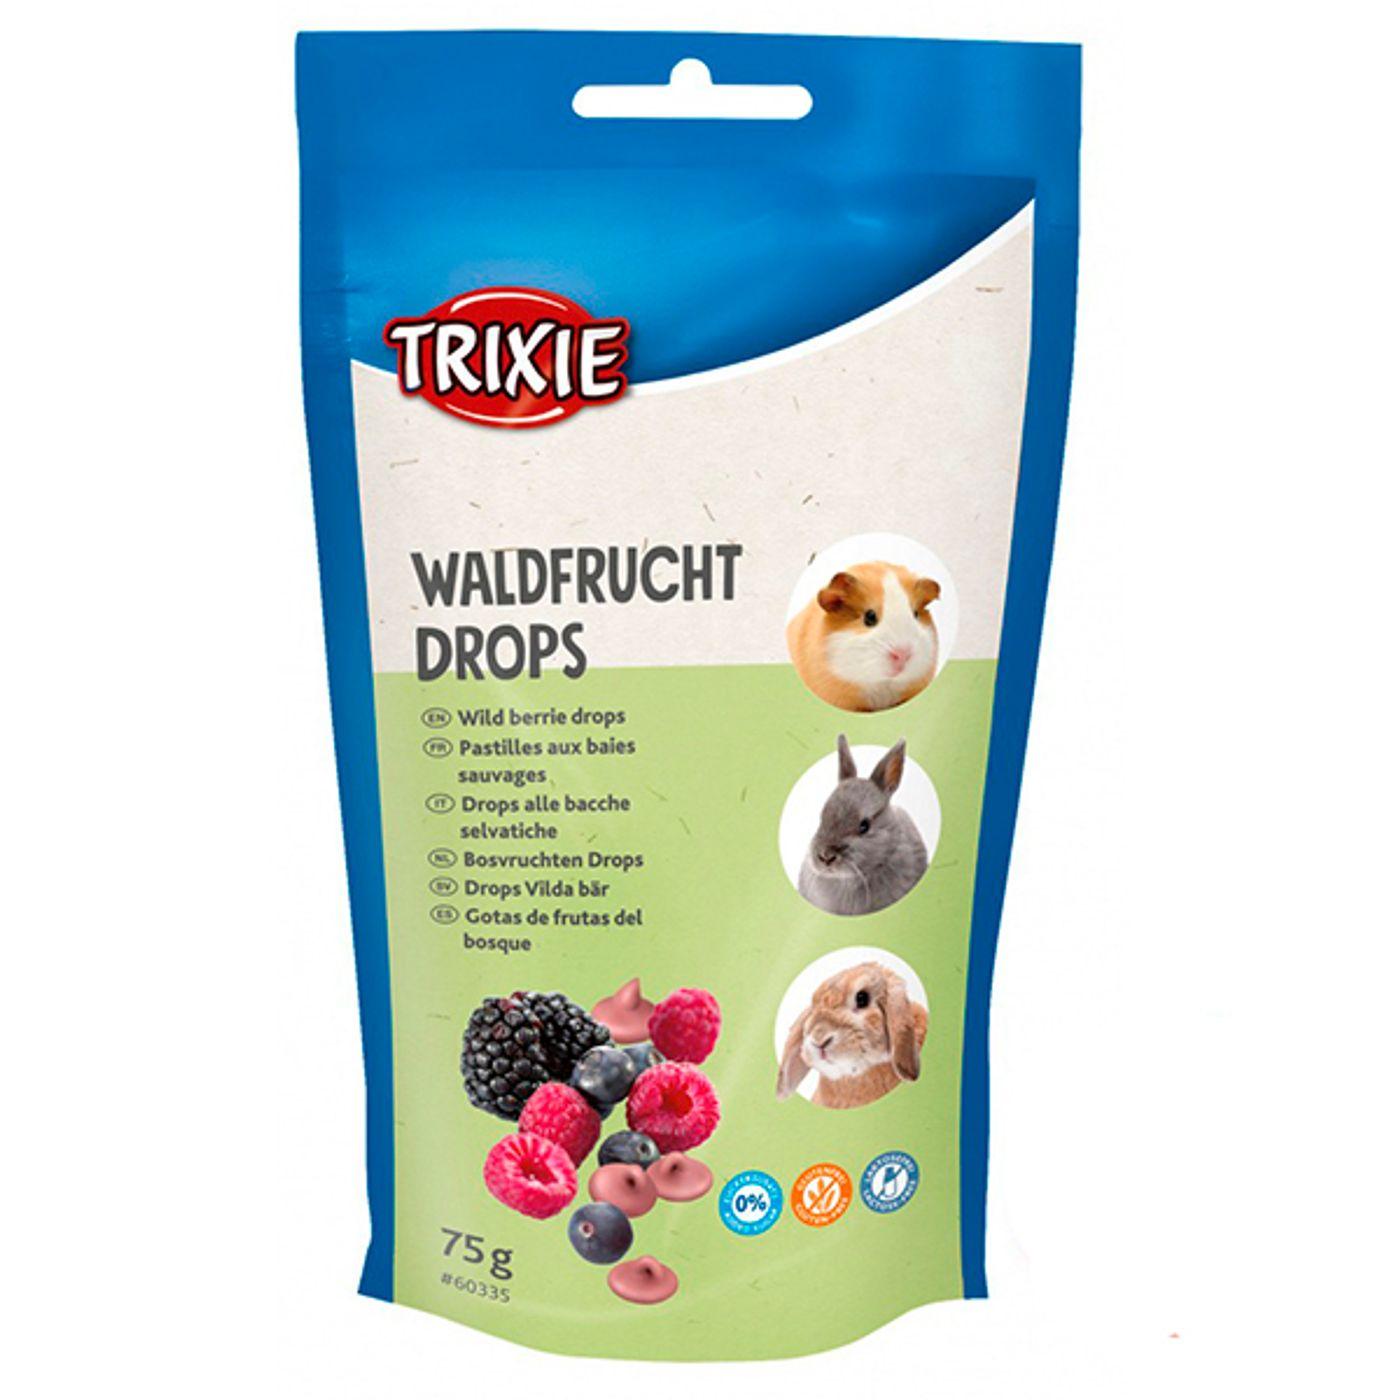 Trixie-bombons-vitaminicos-com-frutos-silvestres-para-roedores